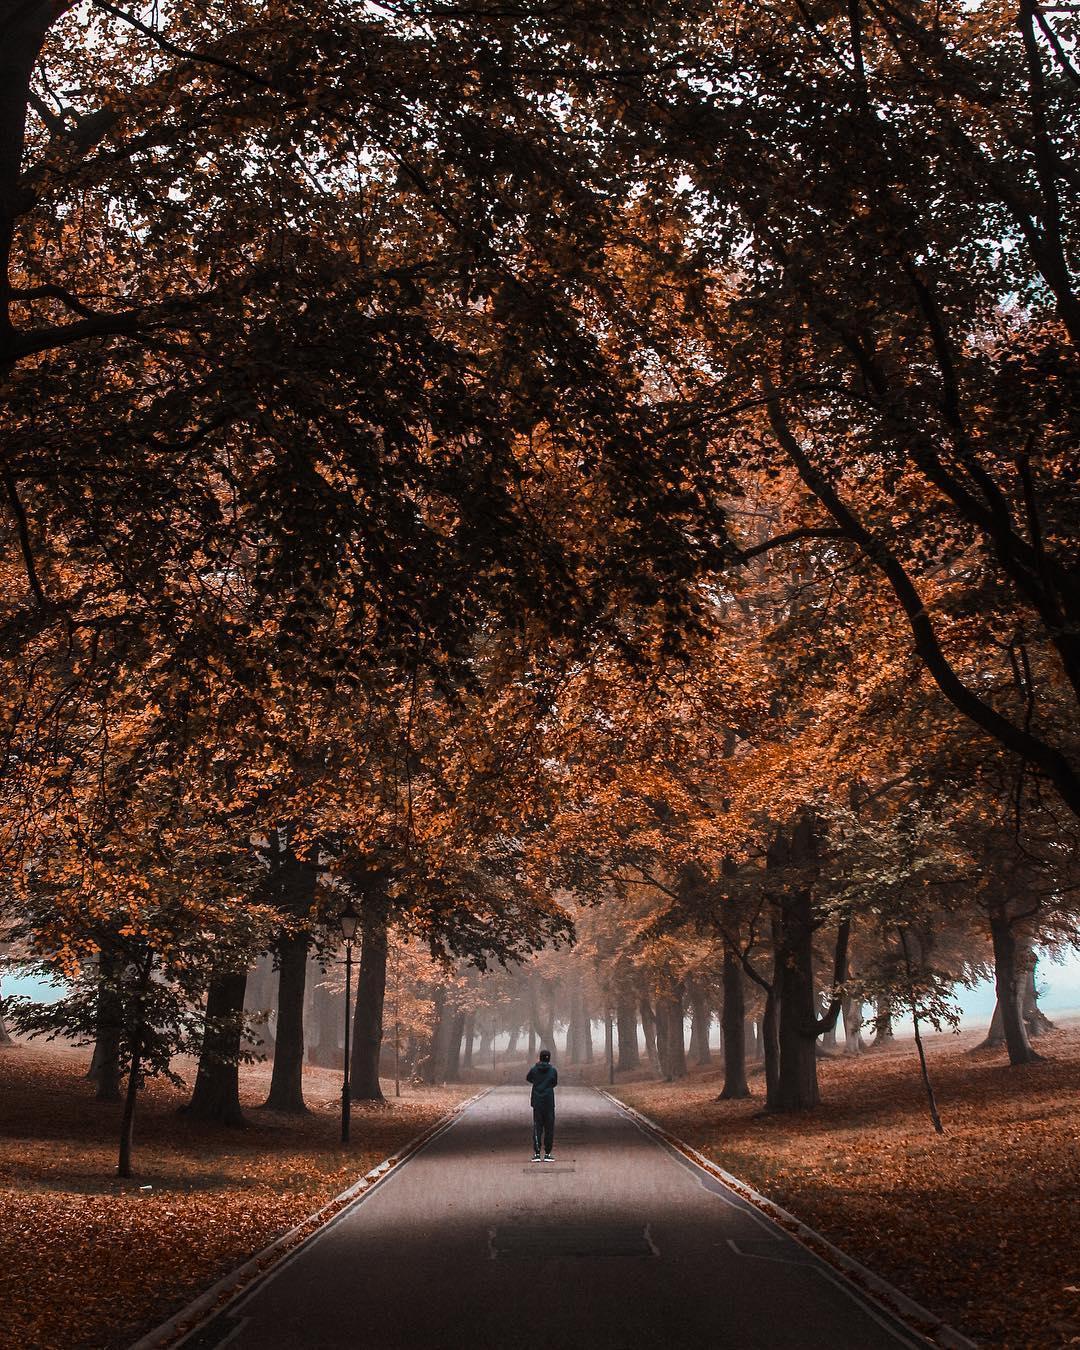 London in the autumn photos, Harpenden